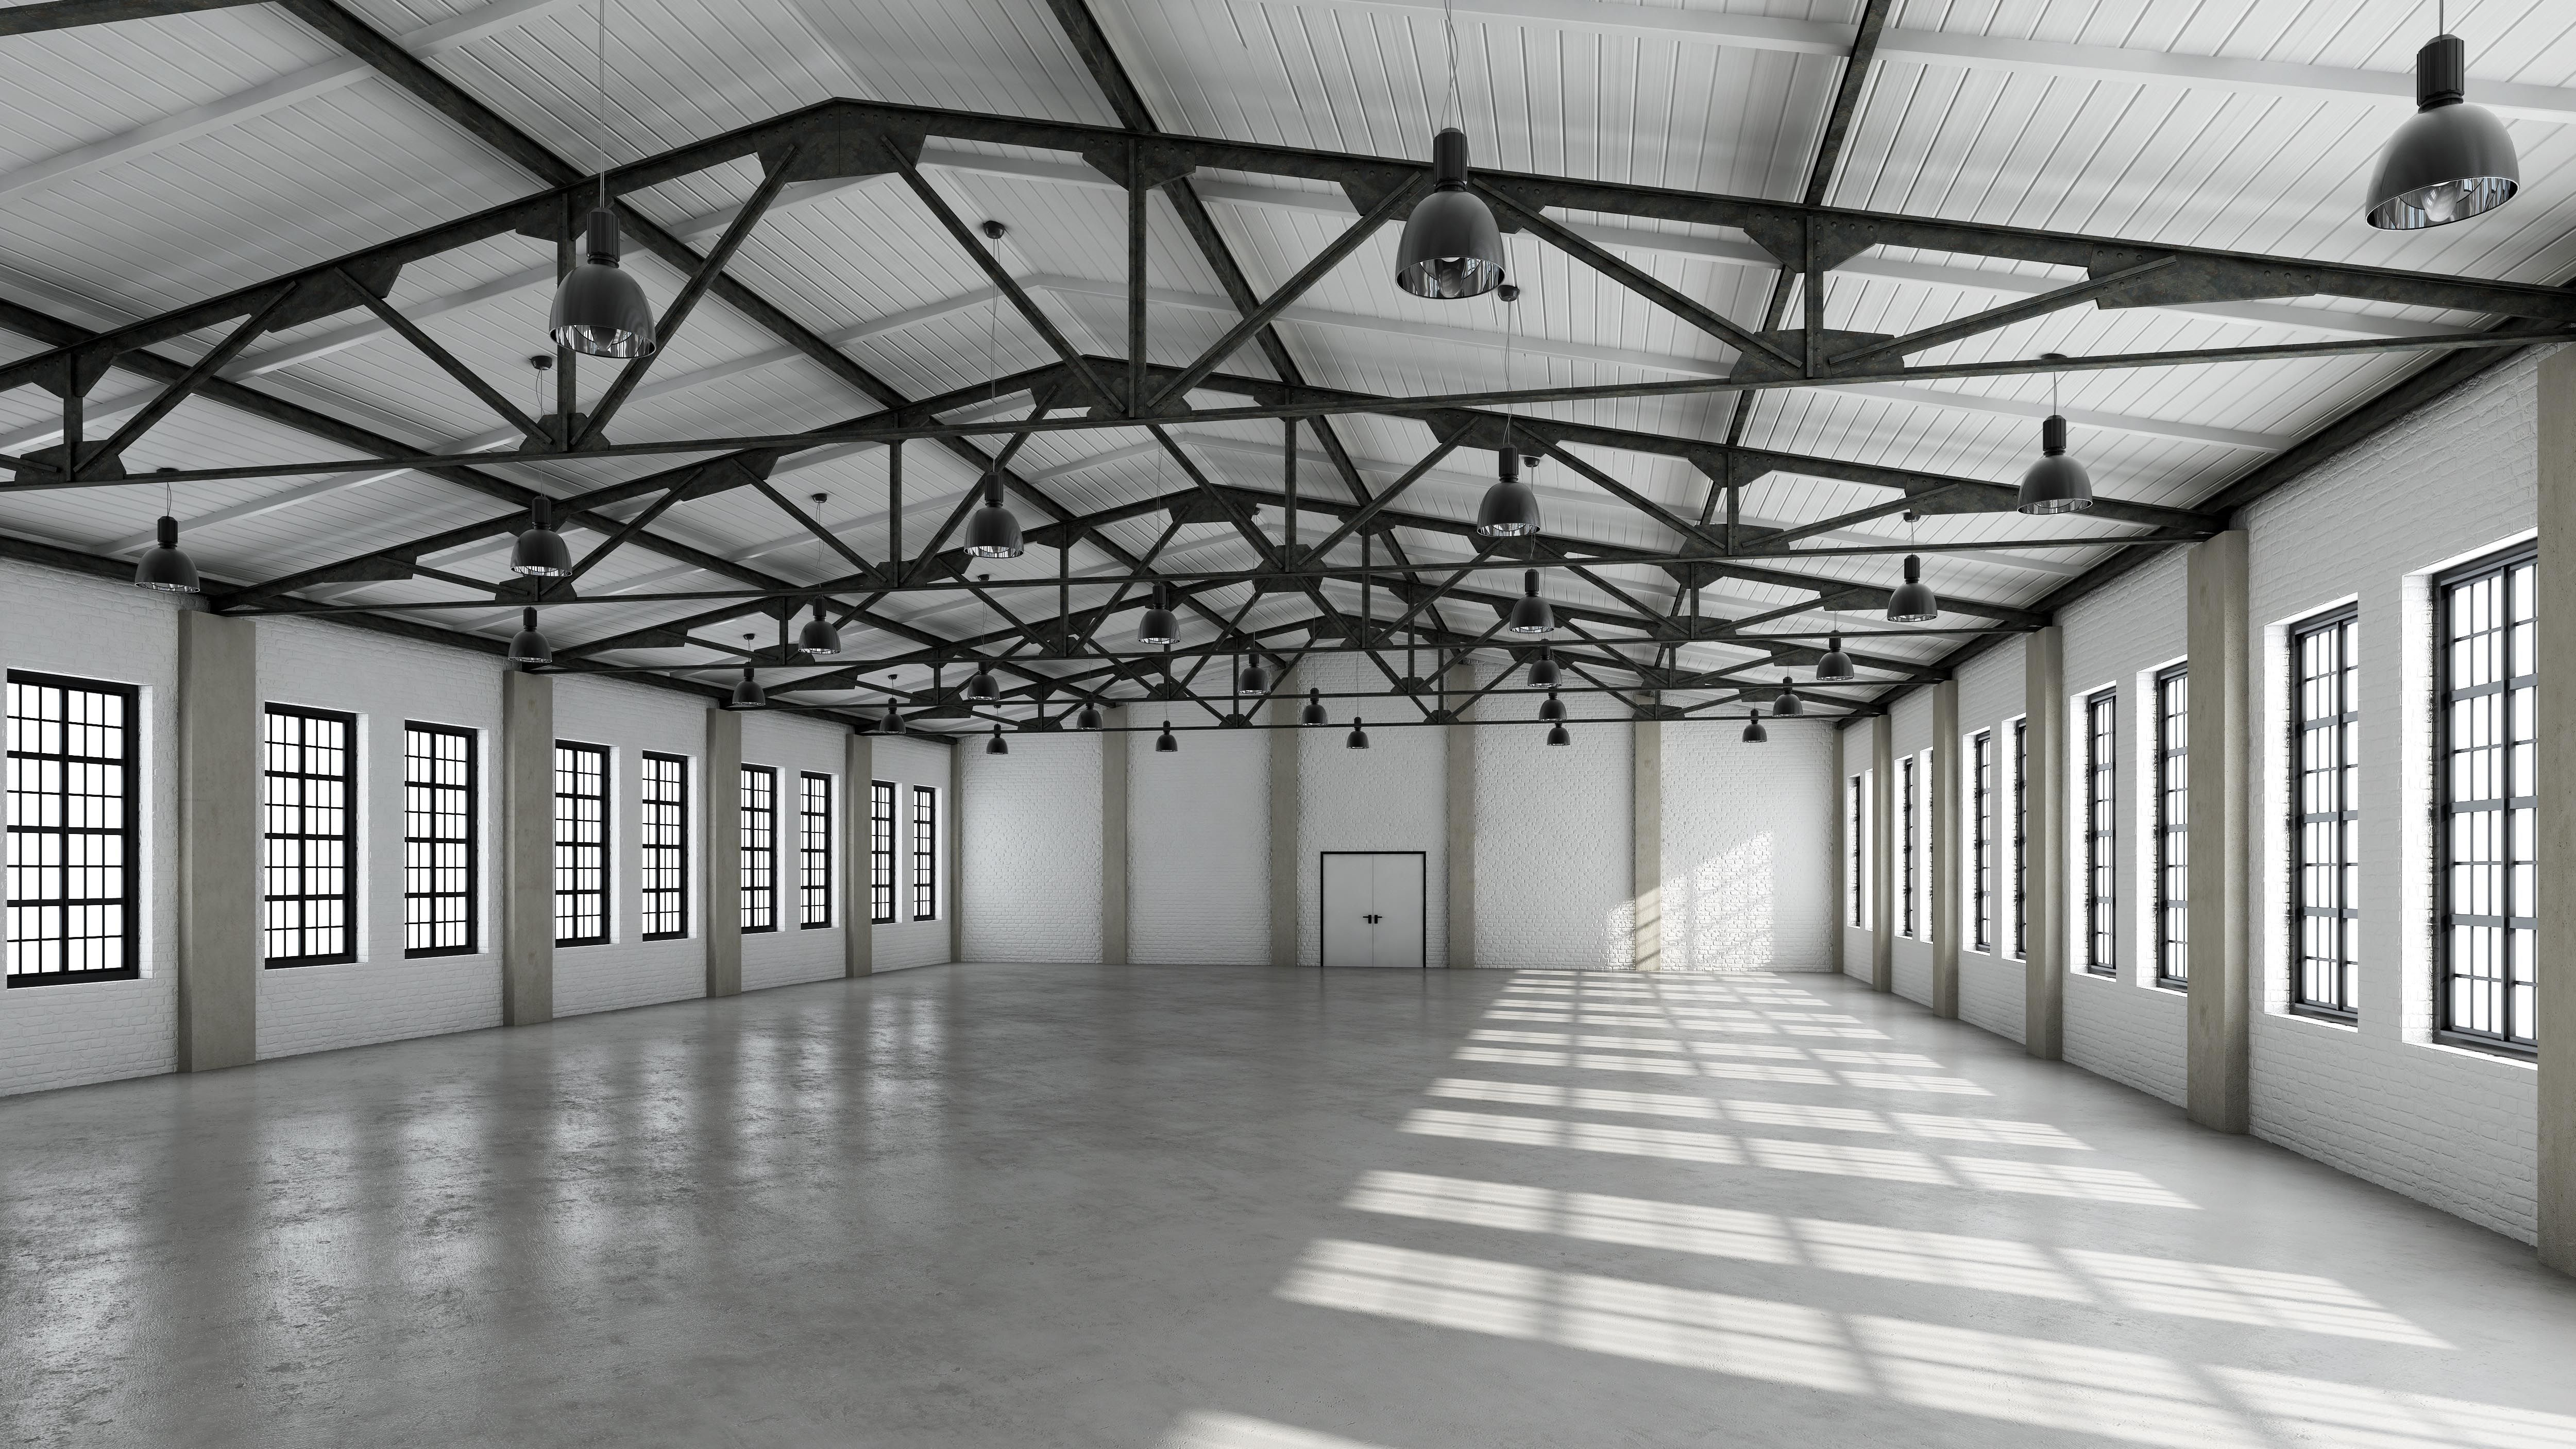 Led High Bay Lights For Your Warehouse Lighting